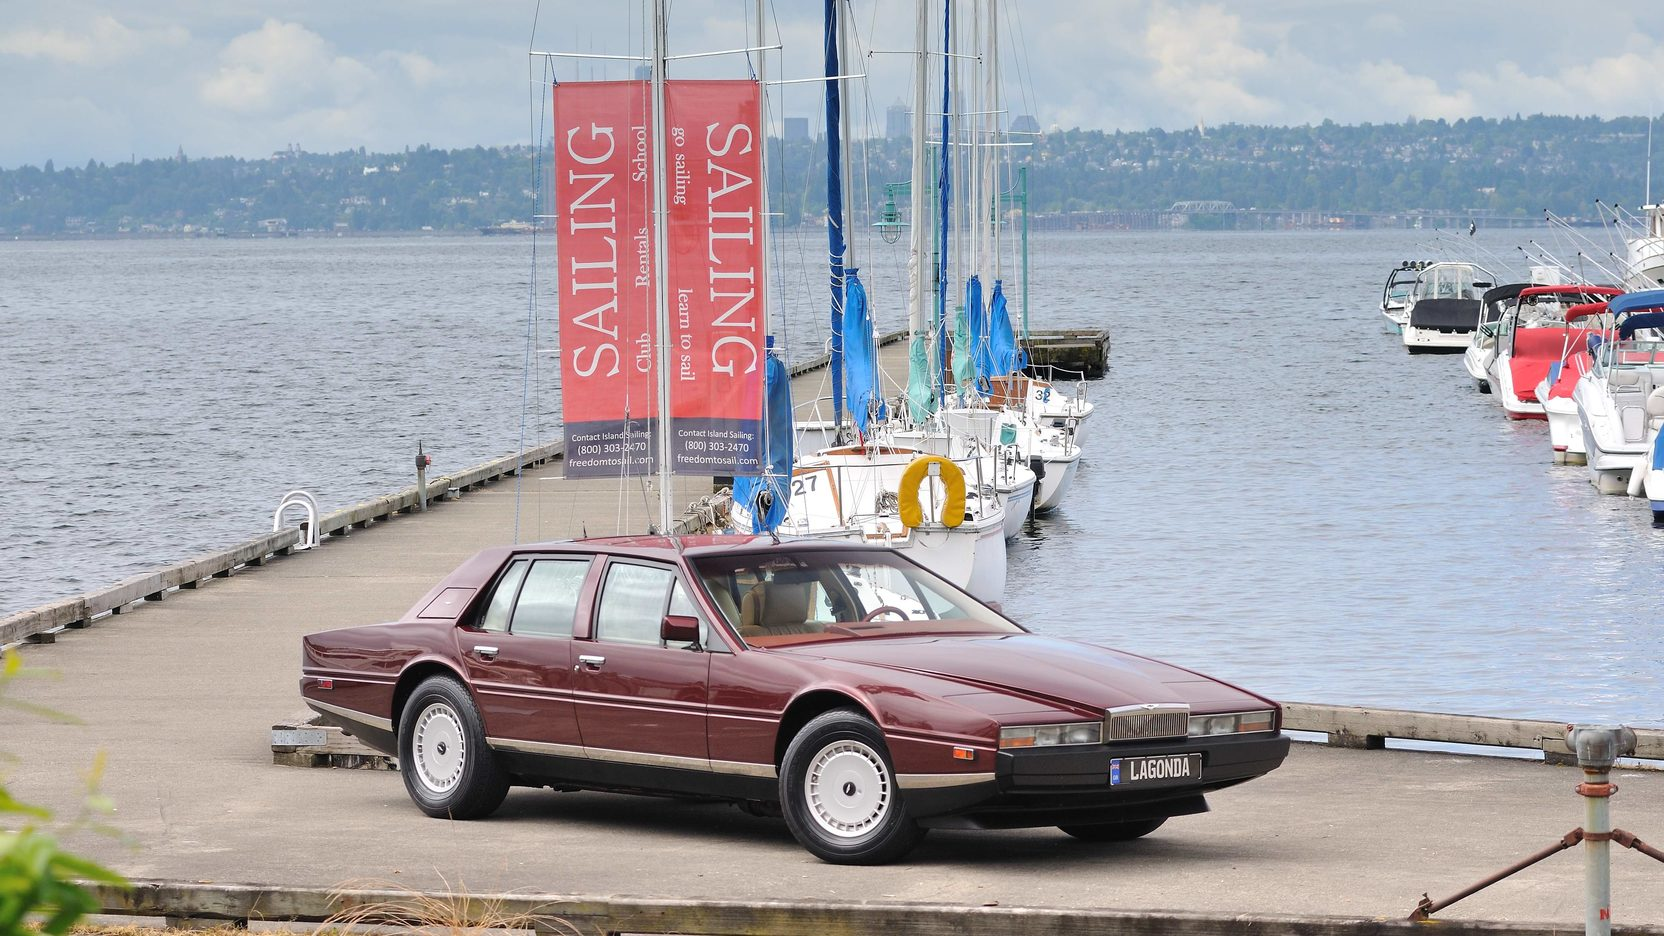 1986 Aston Martin Lagonda Boats